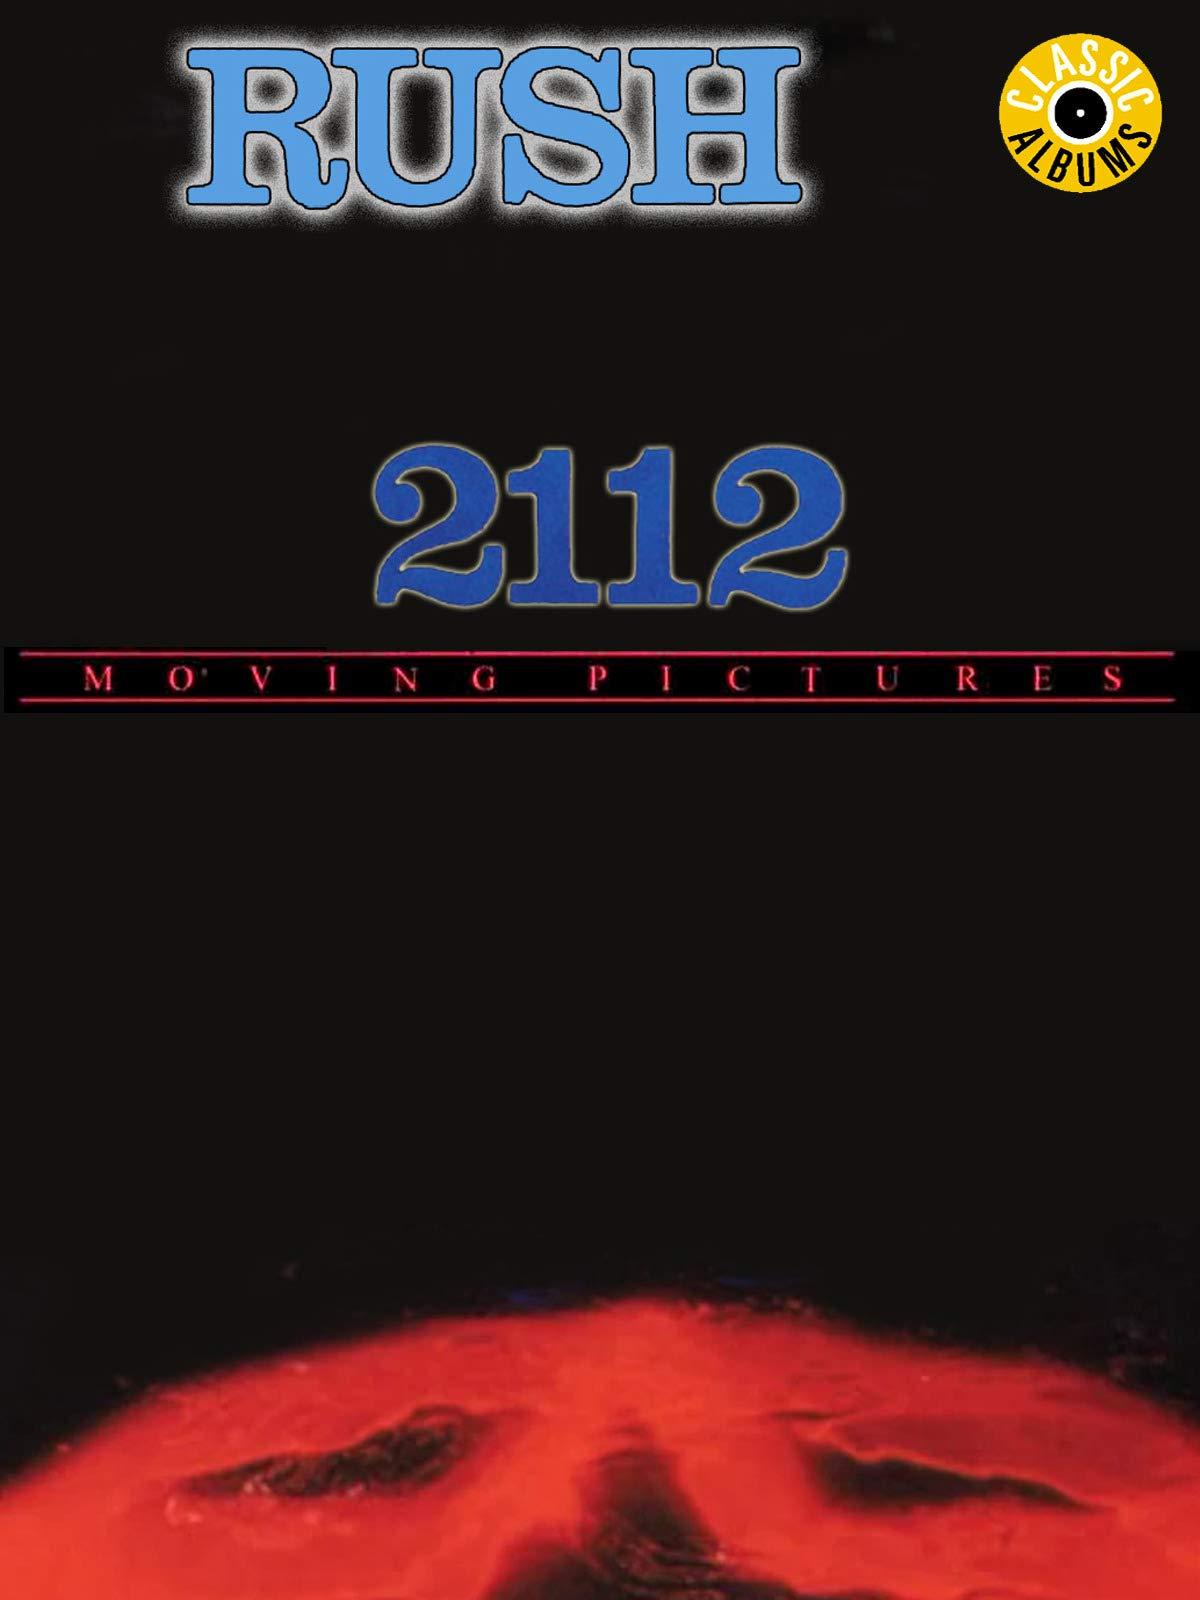 Rush - 2112 & Moving Pictures (Classic Album) on Amazon Prime Video UK